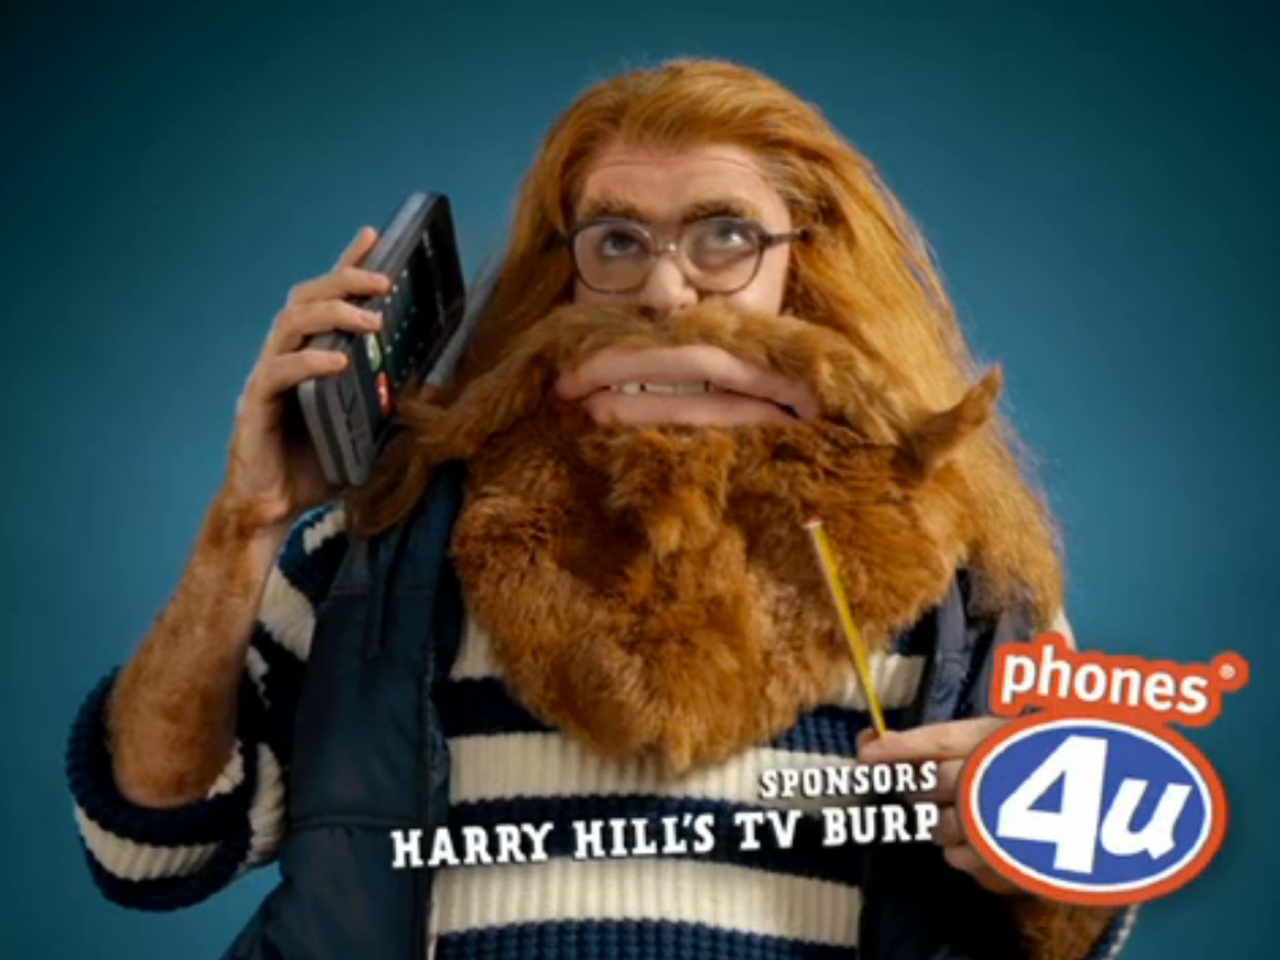 Phones4U - 'Harry Hill' Idents